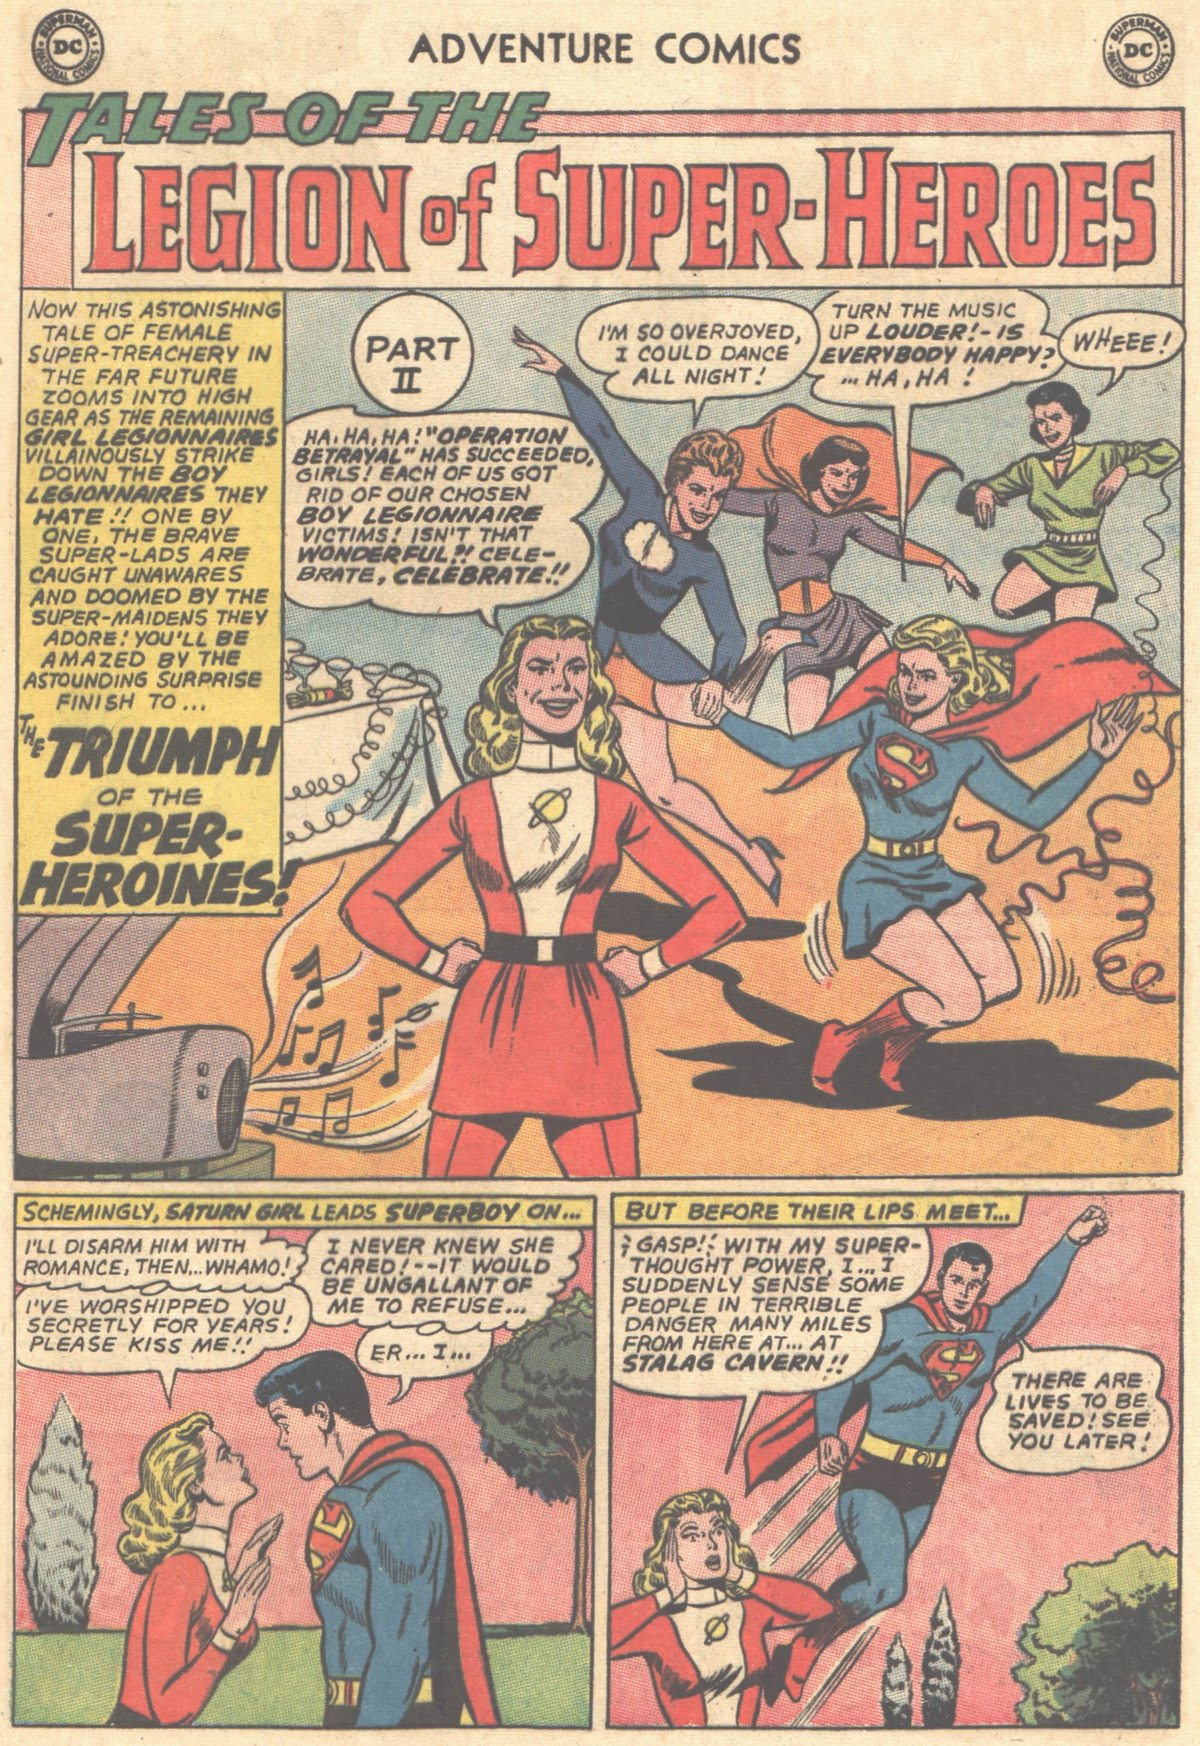 Read online Adventure Comics (1938) comic - Issue #326